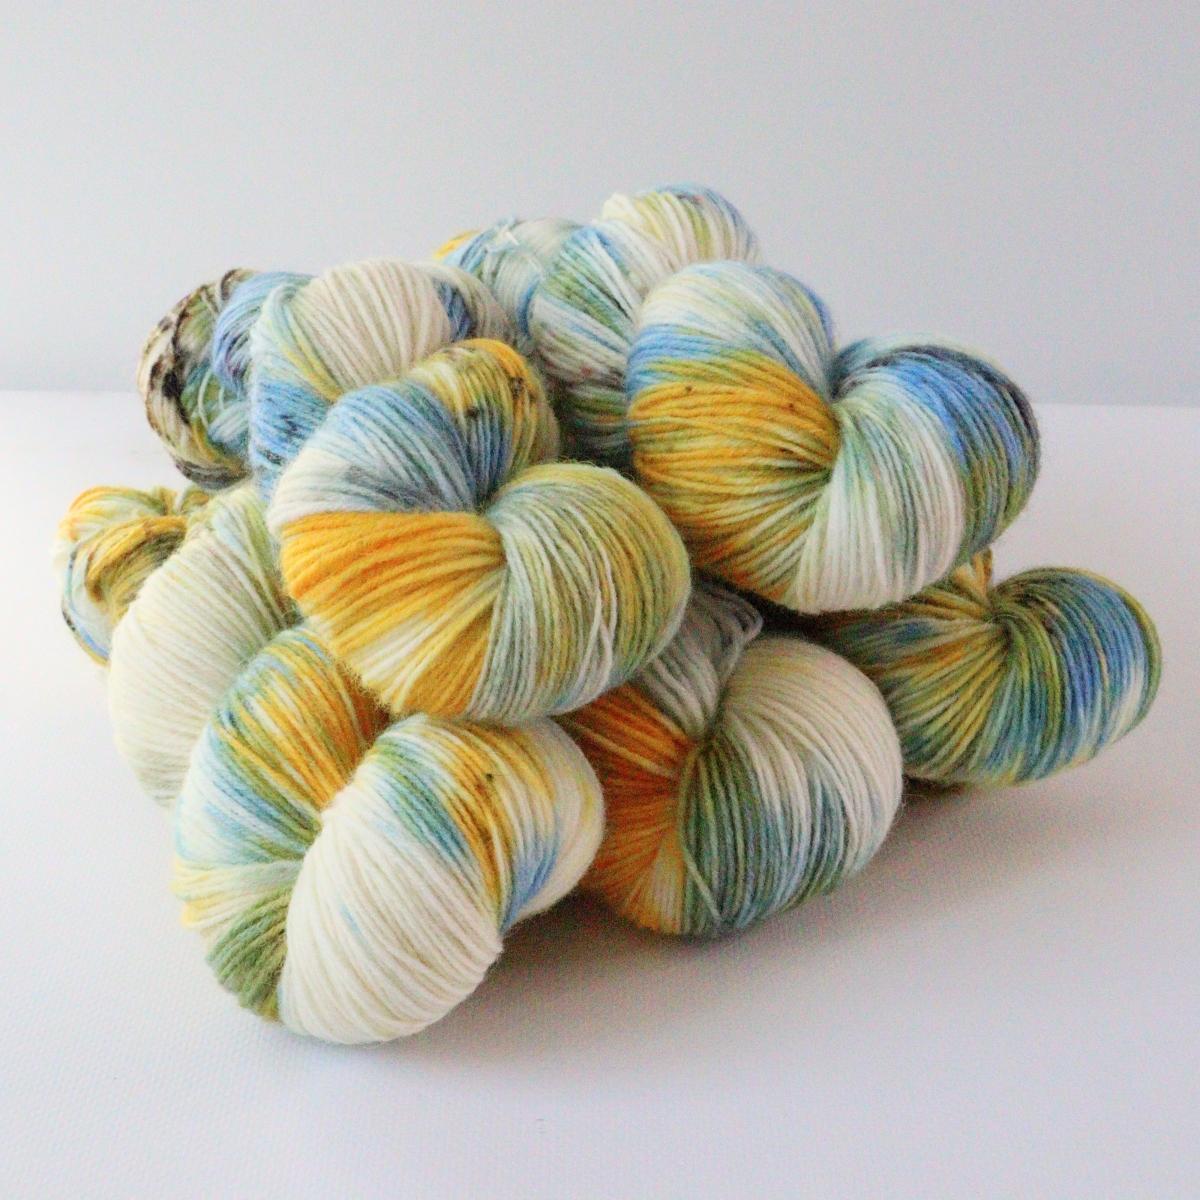 woodico.pro hand dyed yarn 087 2 1200x1200 - Hand dyed yarn / 087